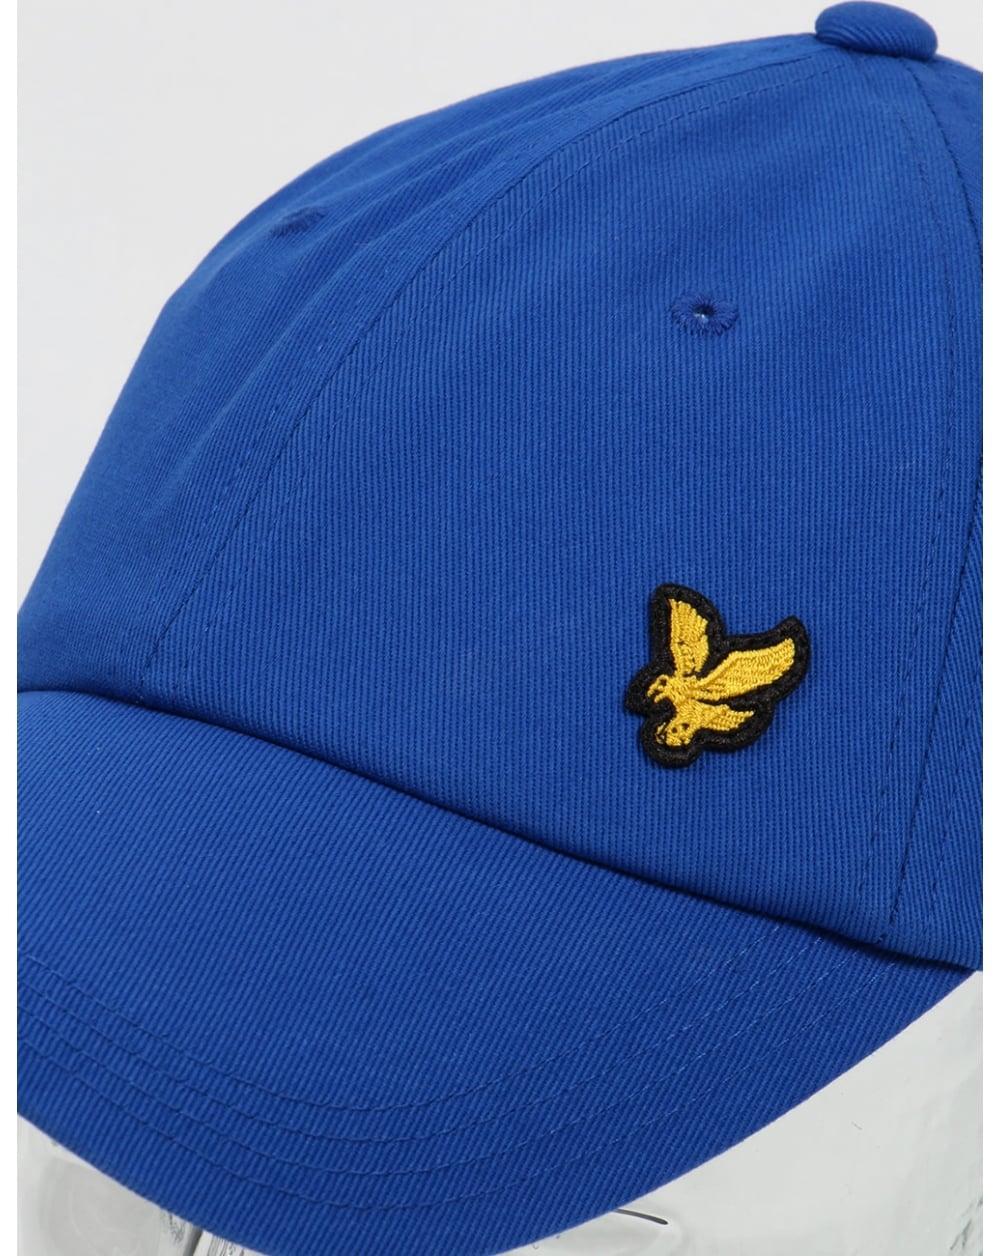 lyle and golf baseball cap duke blue hat mens trucker